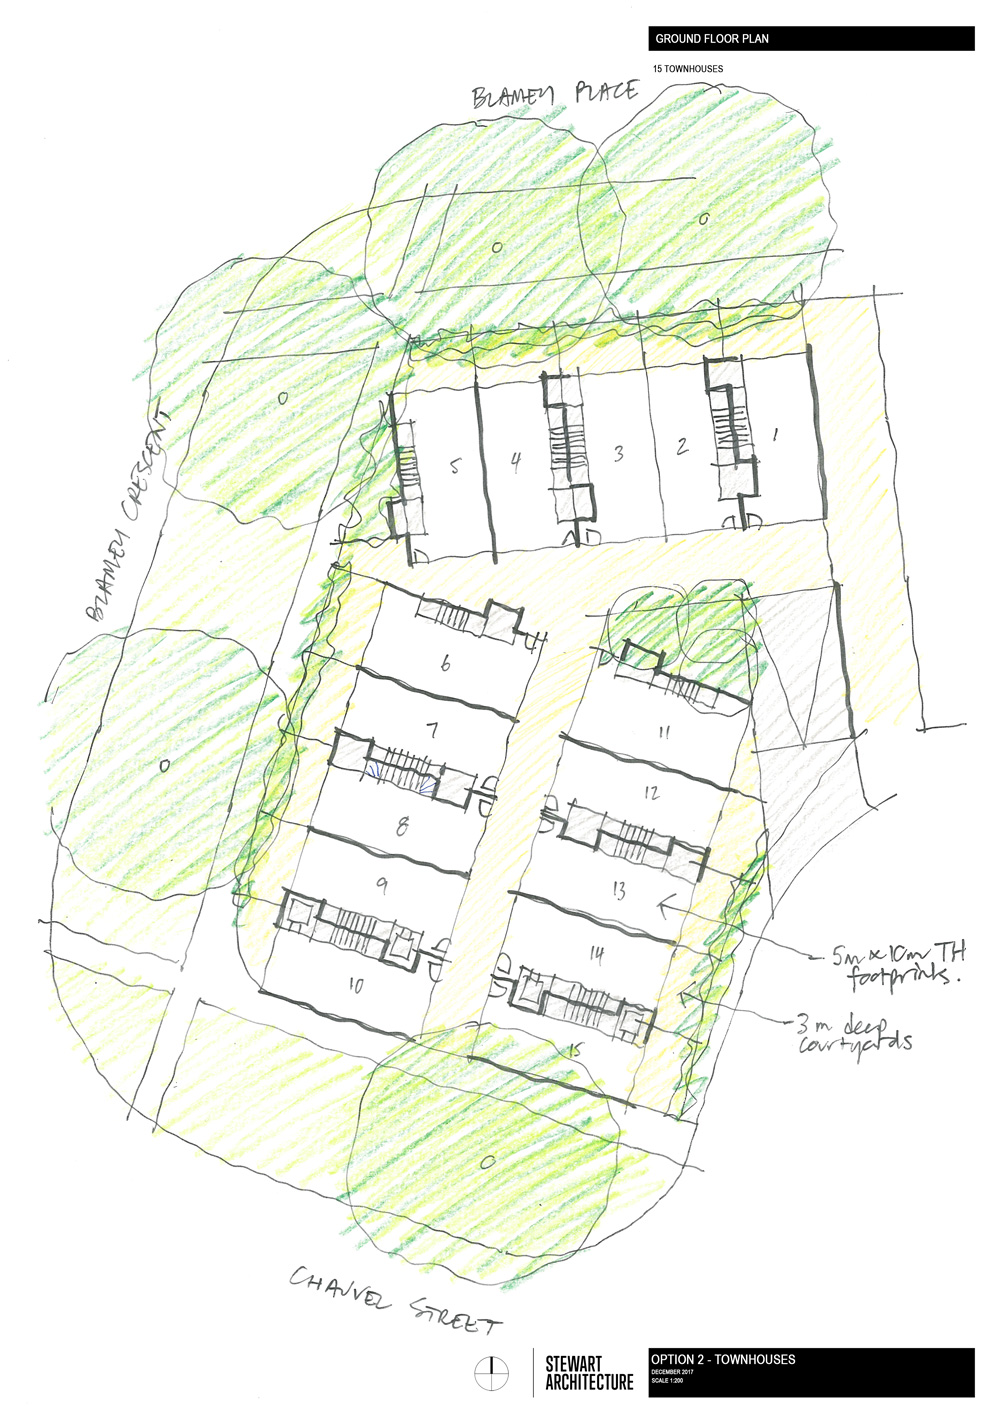 171211-1647-002-Option-2-Ground.jpg